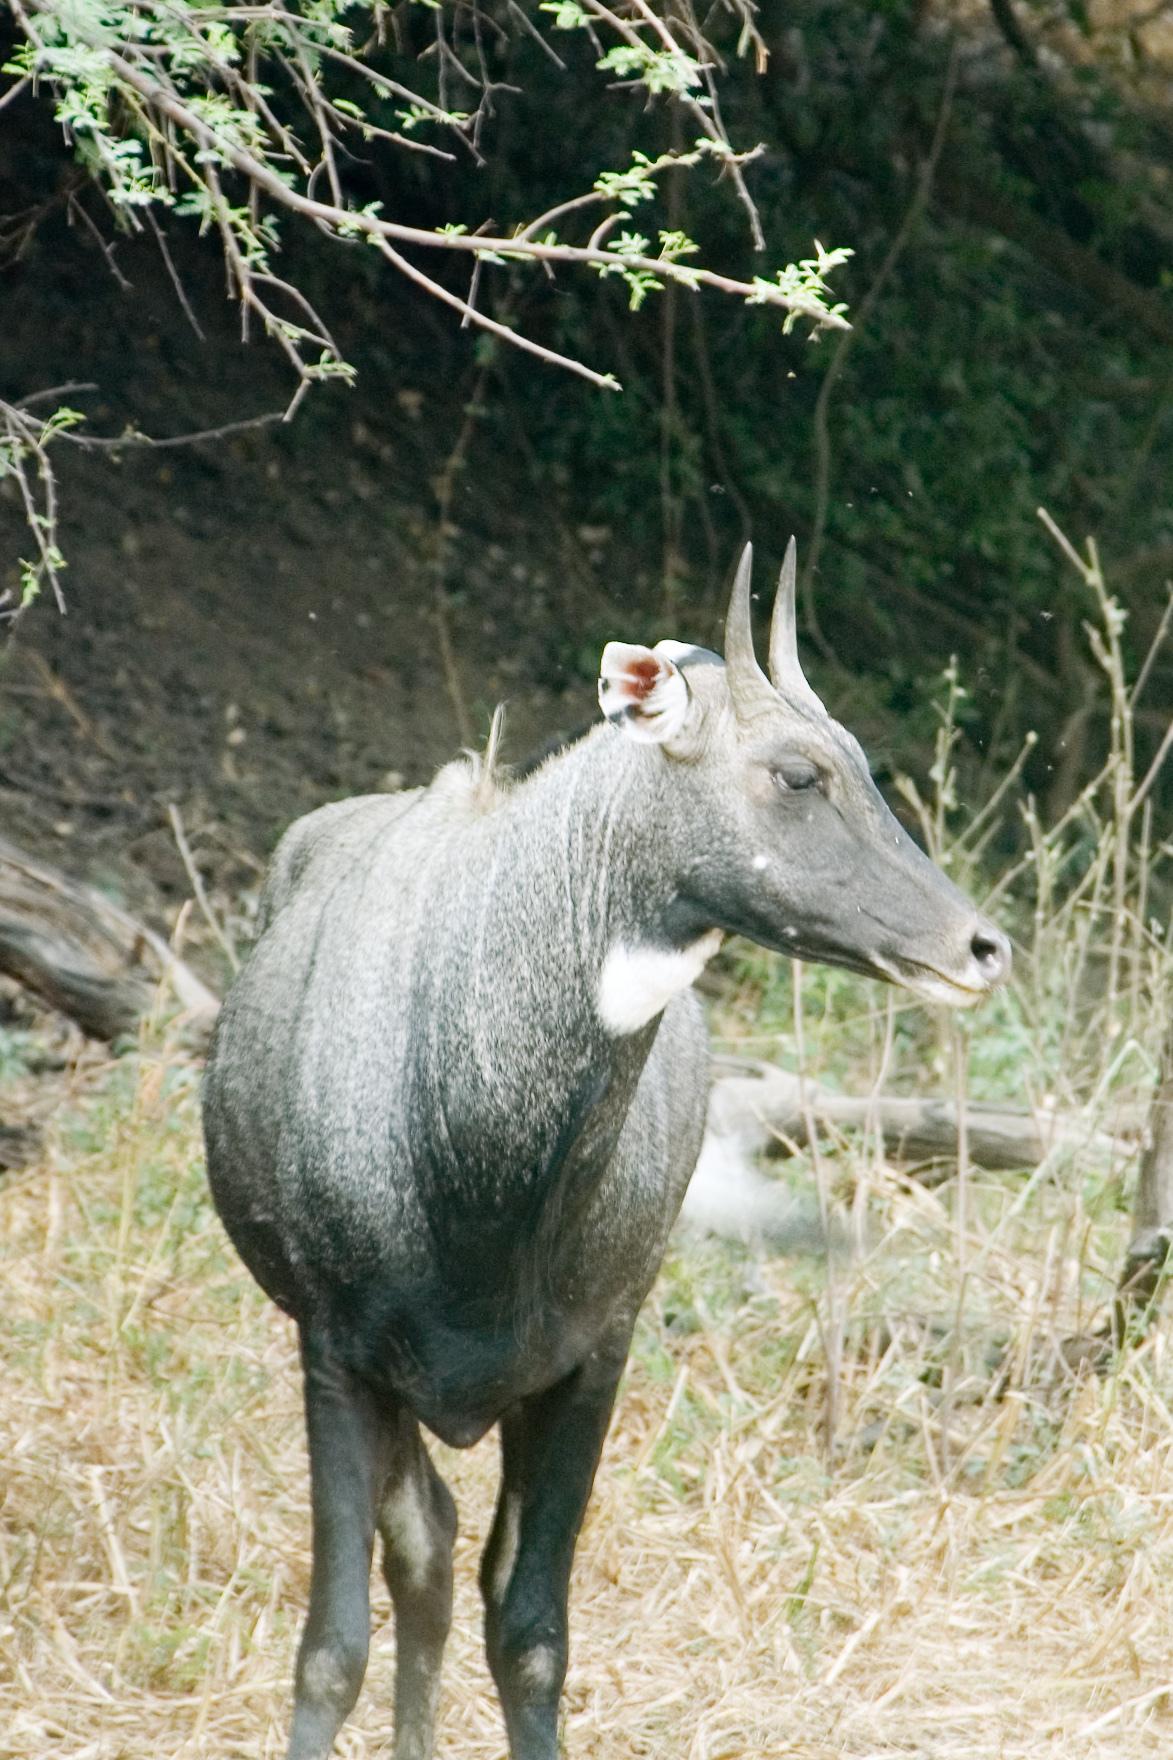 Image of nilgai